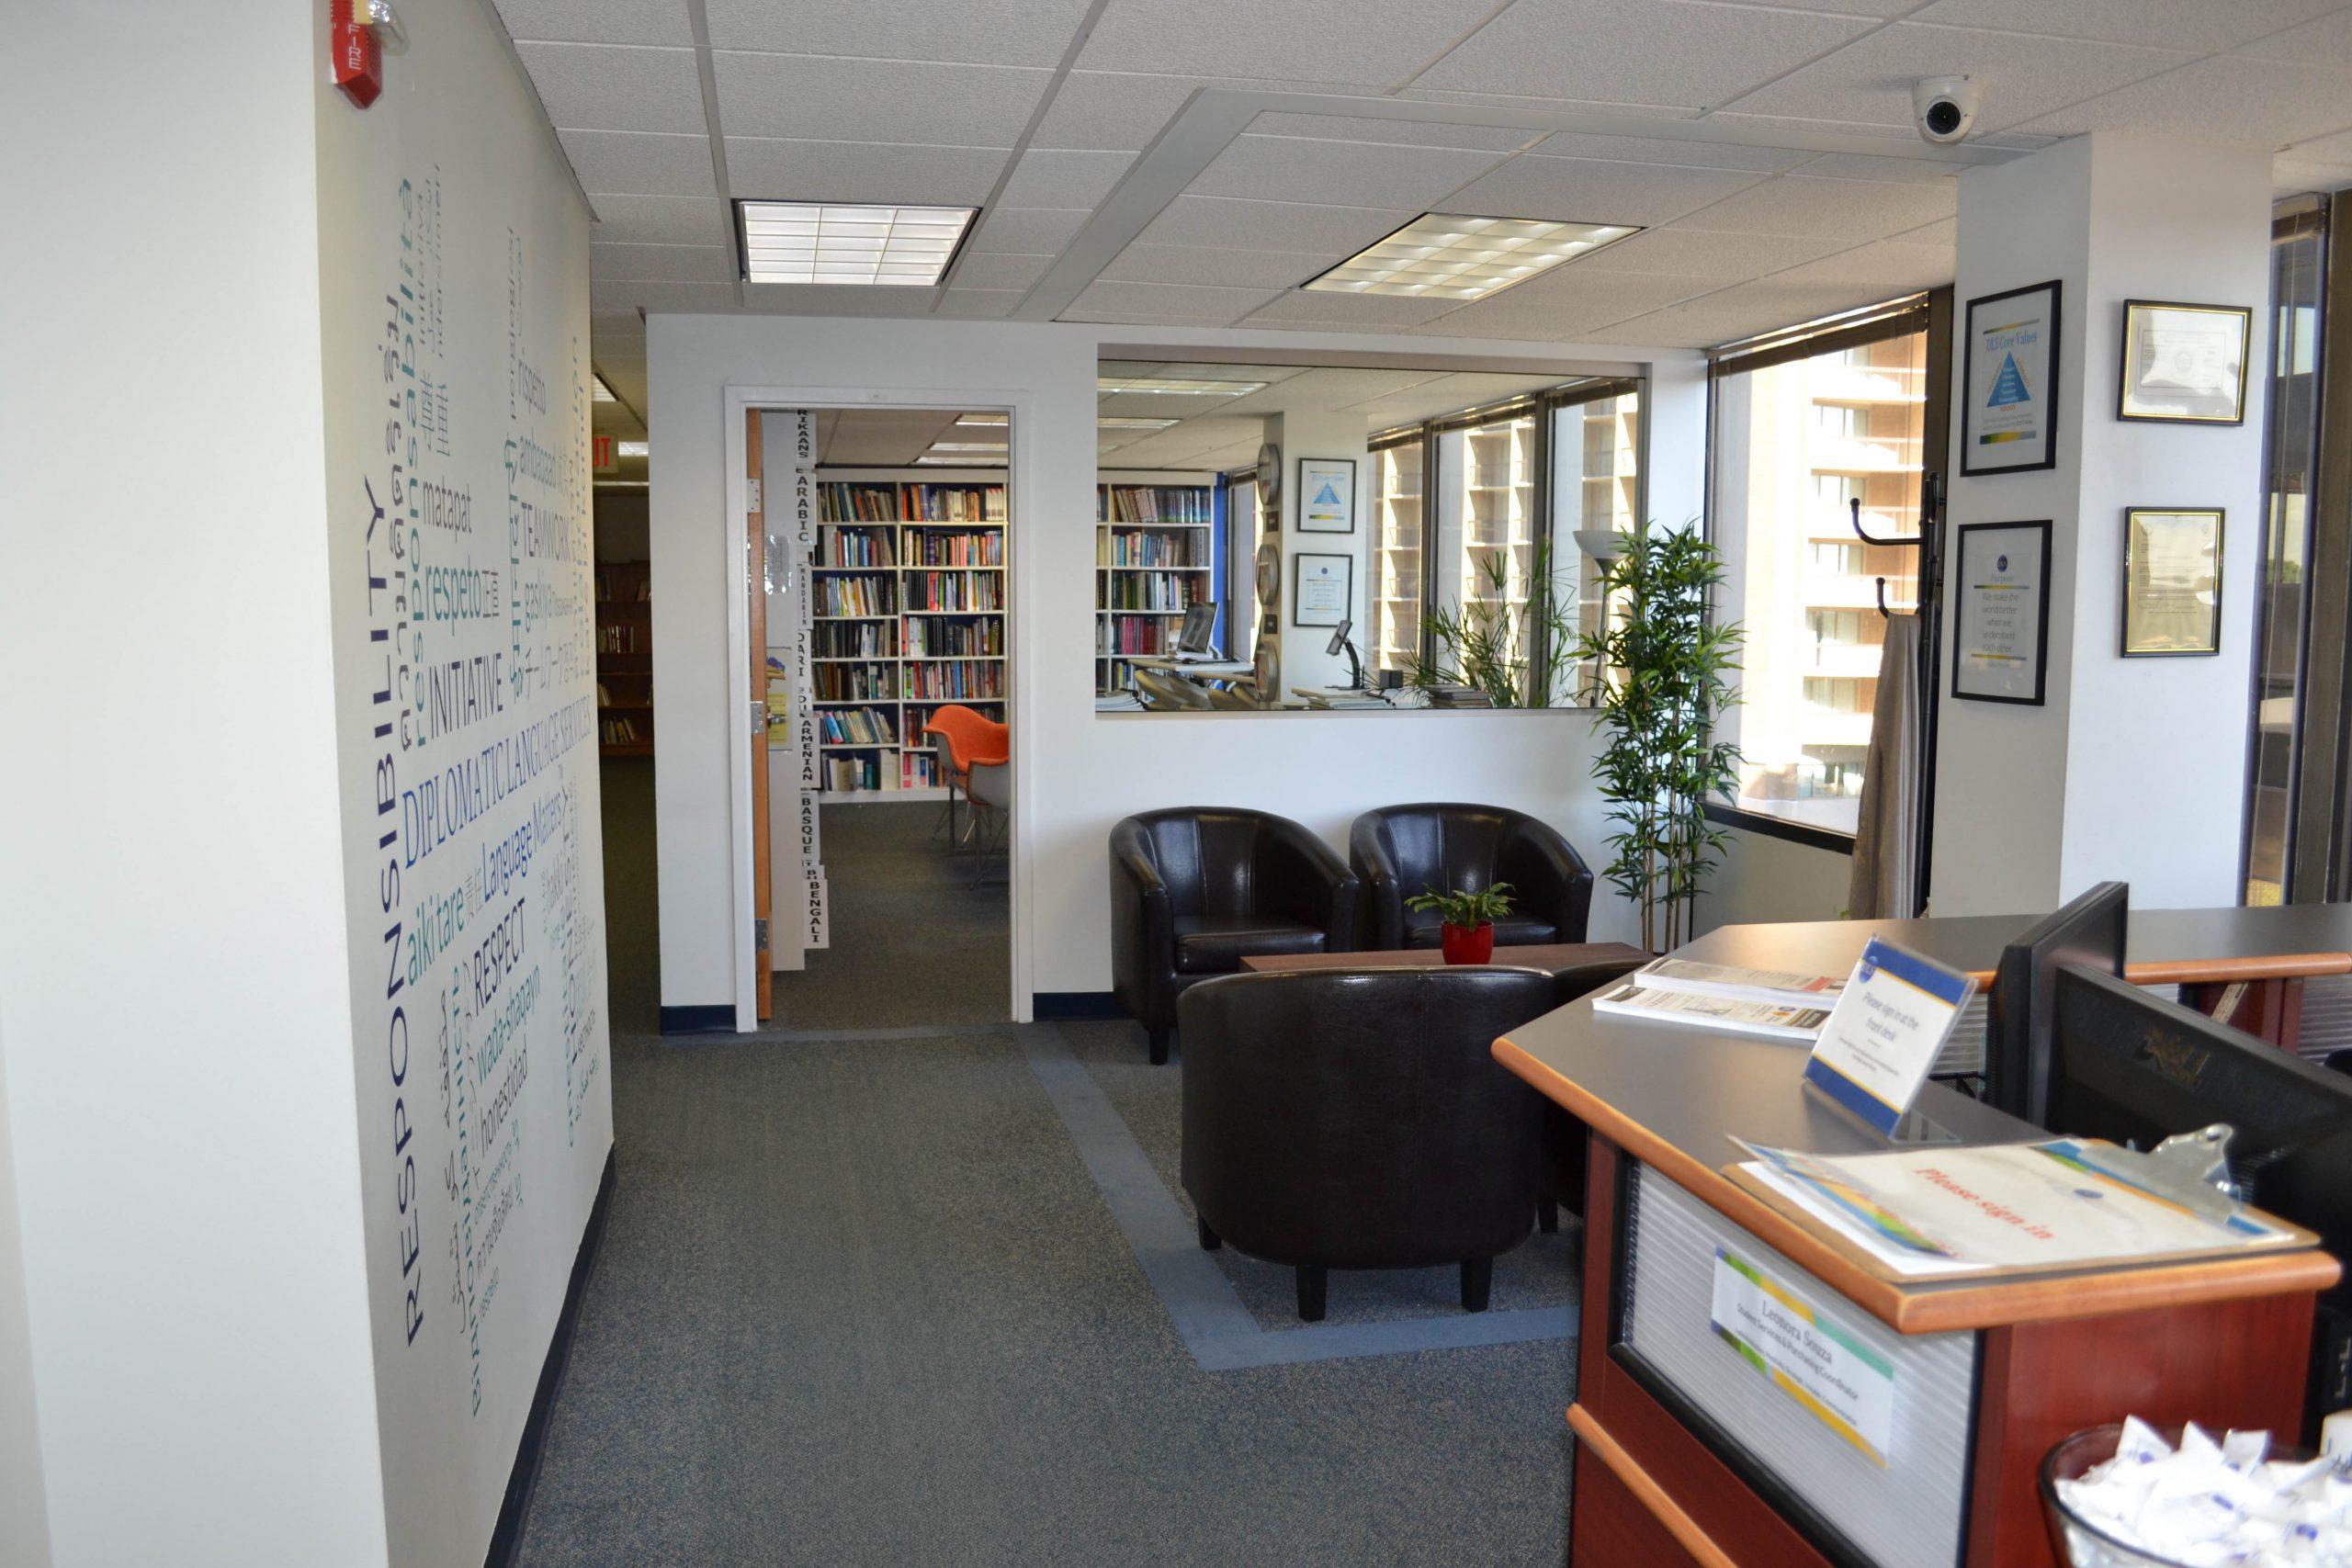 Diplomatic Language Services Arlington location lobby and waiting area